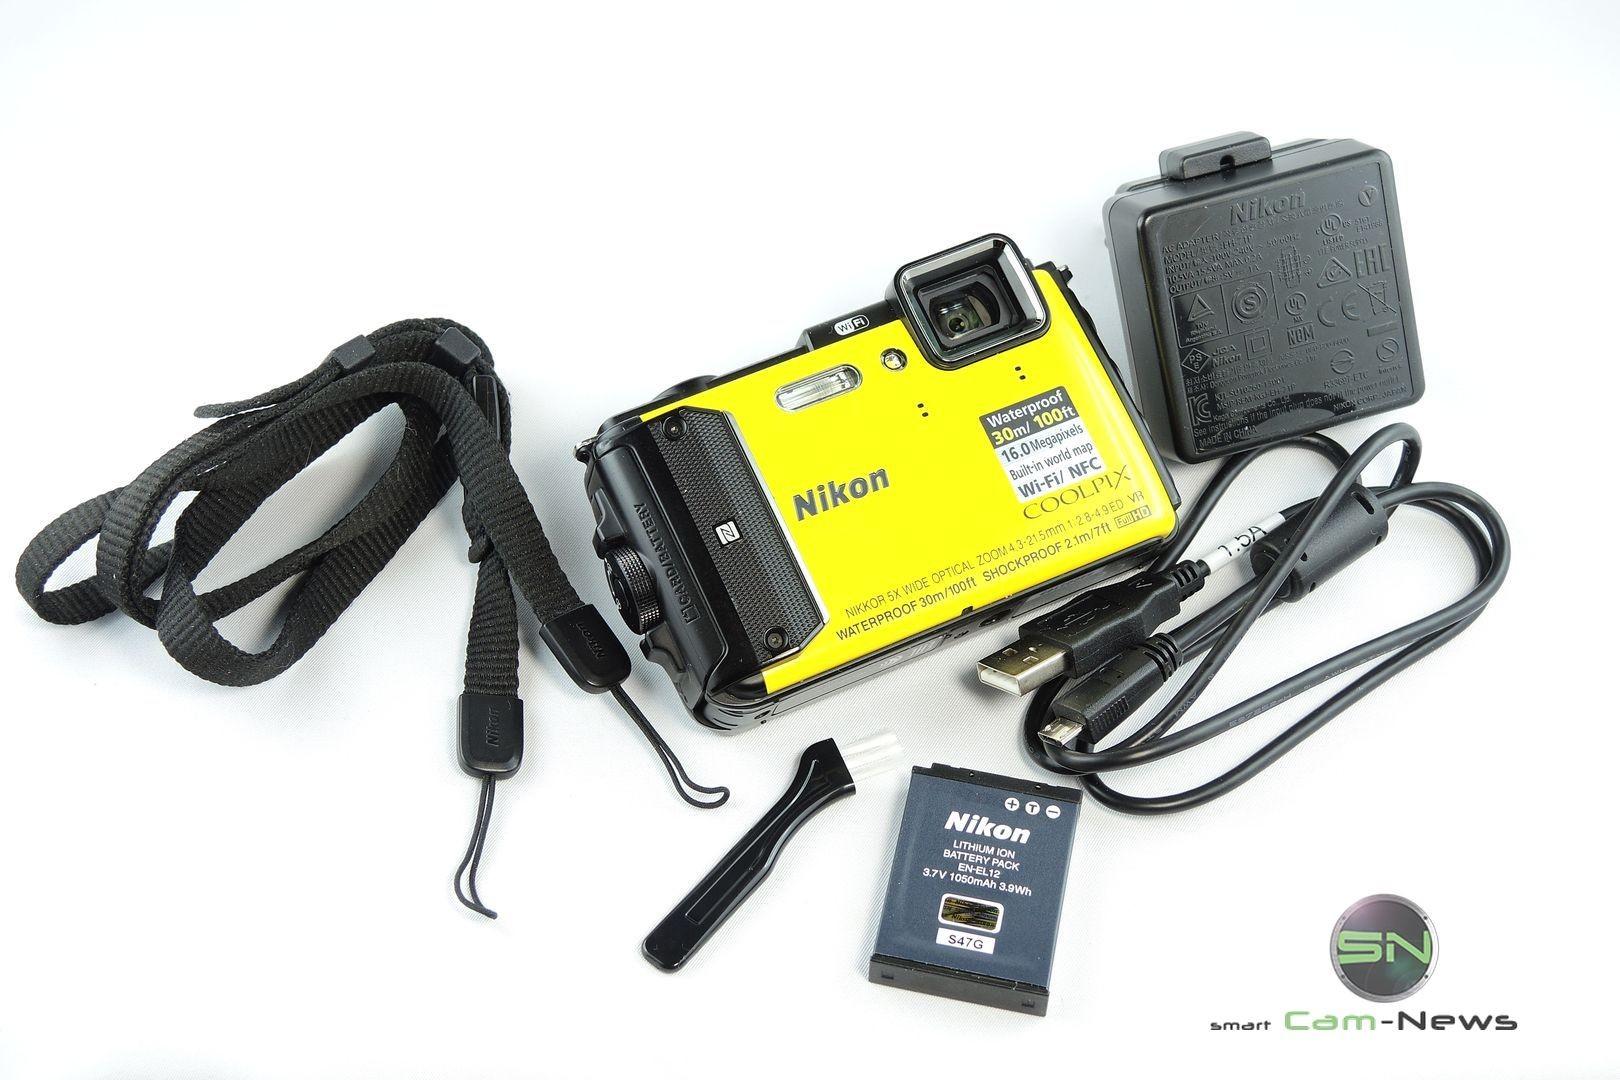 Unboxing Nikon AW130 - SmartCamNews